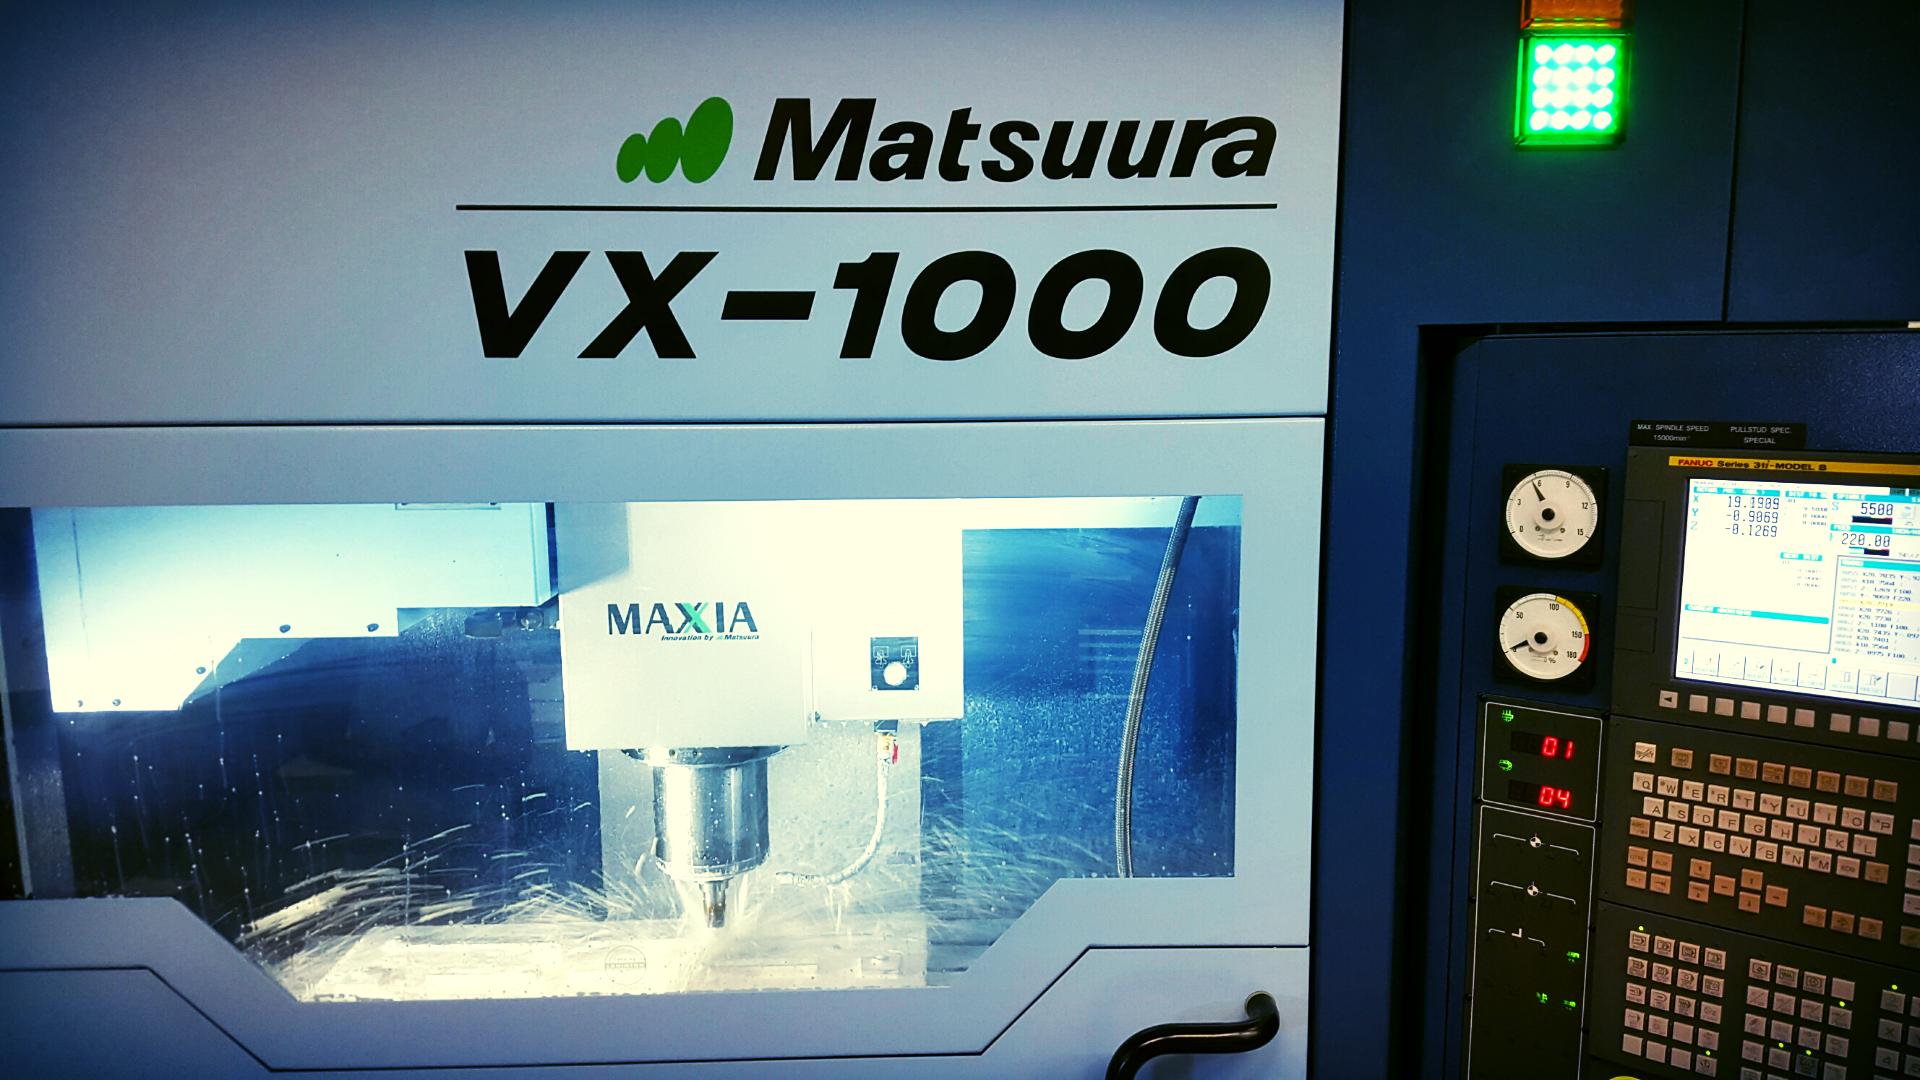 matsuura 3_edited.jpg